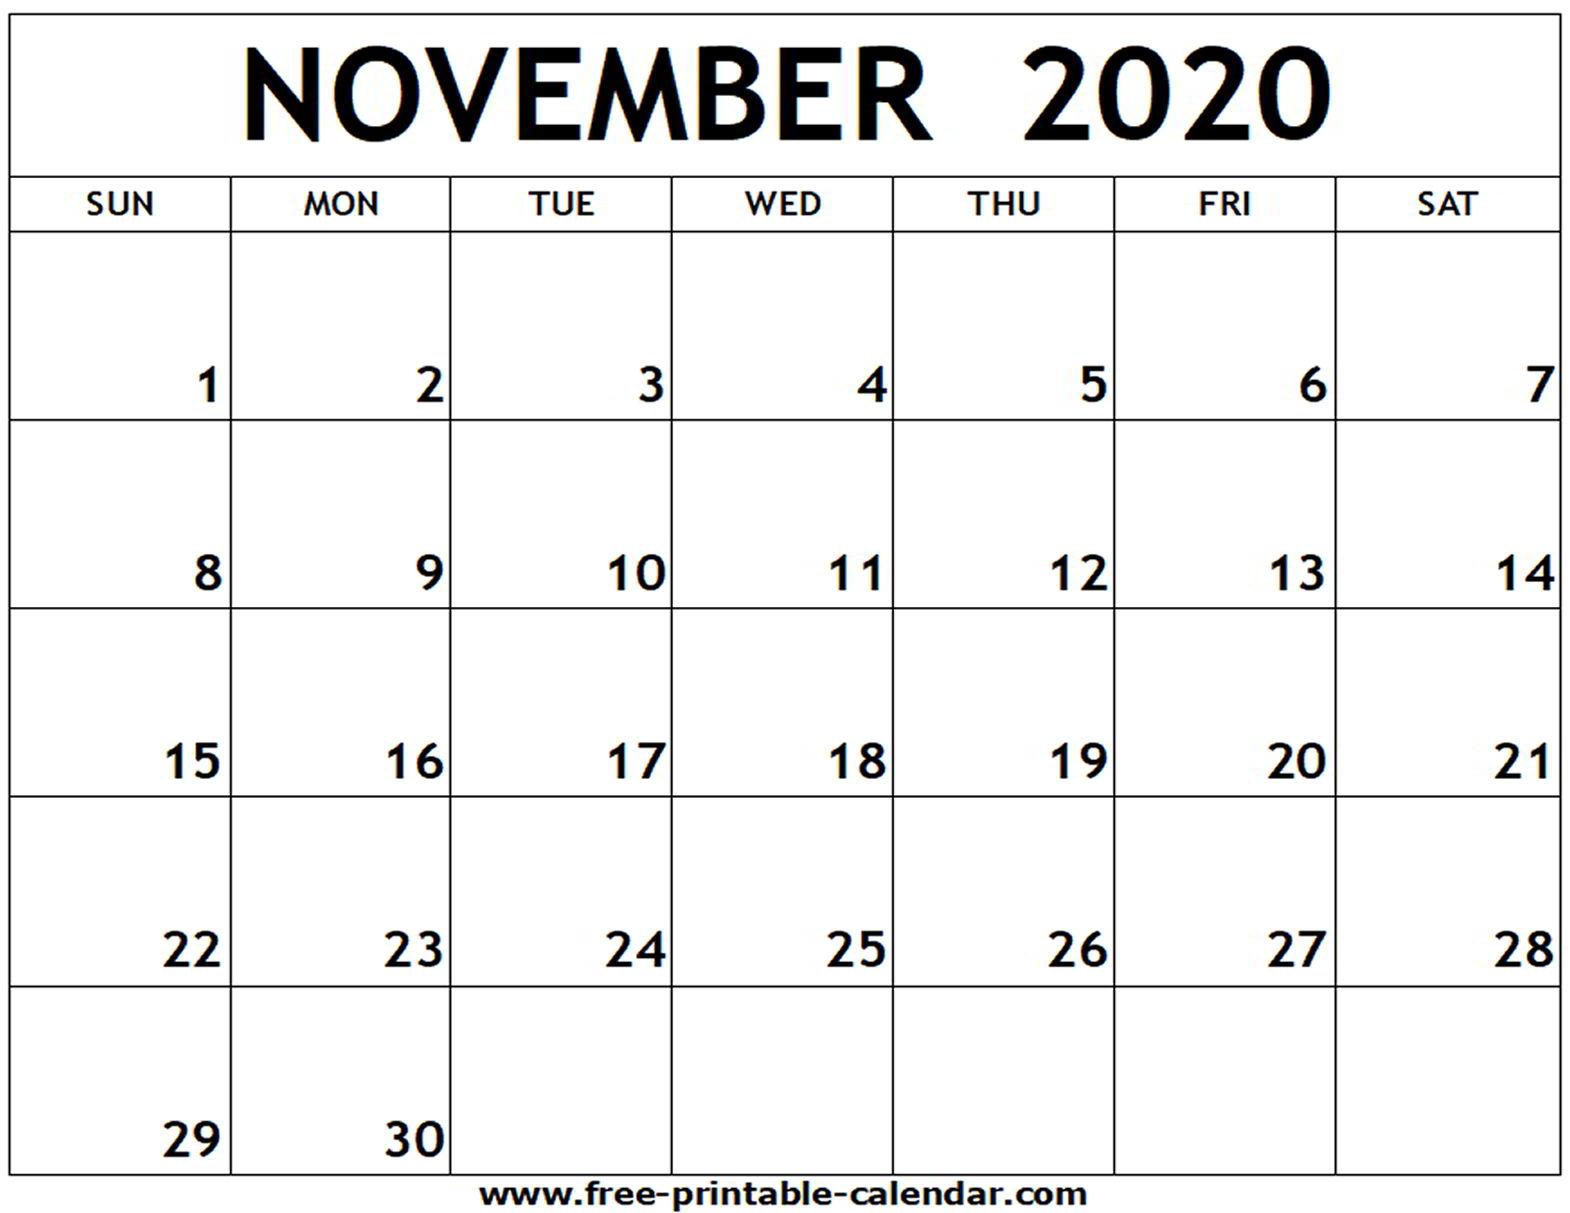 Free November 2020 Calendar - Togo.wpart.co